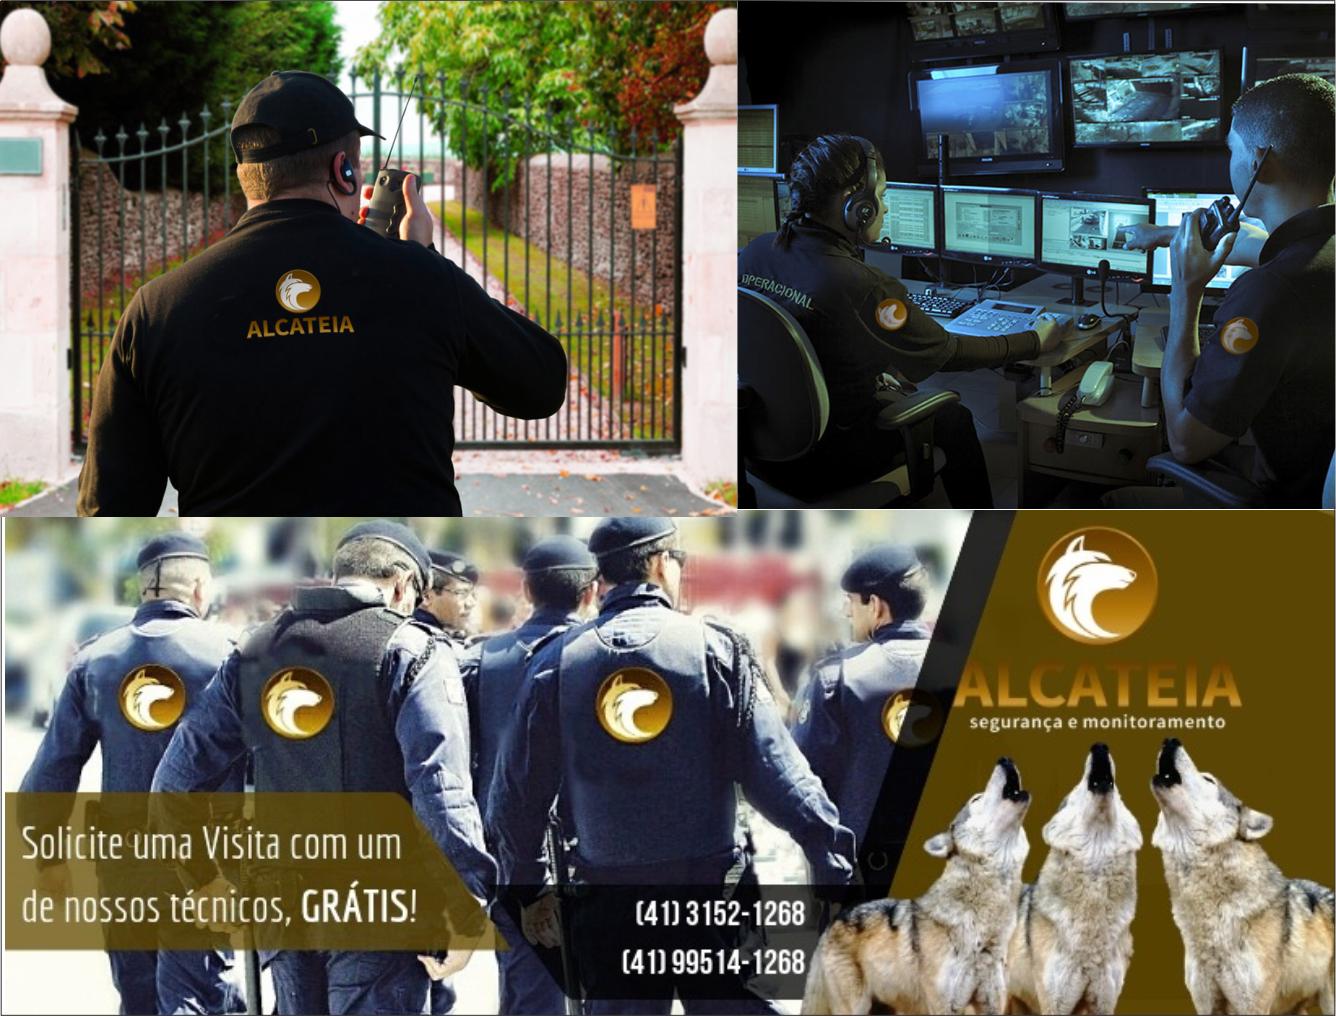 Alcatéia Segurança e monitoramento